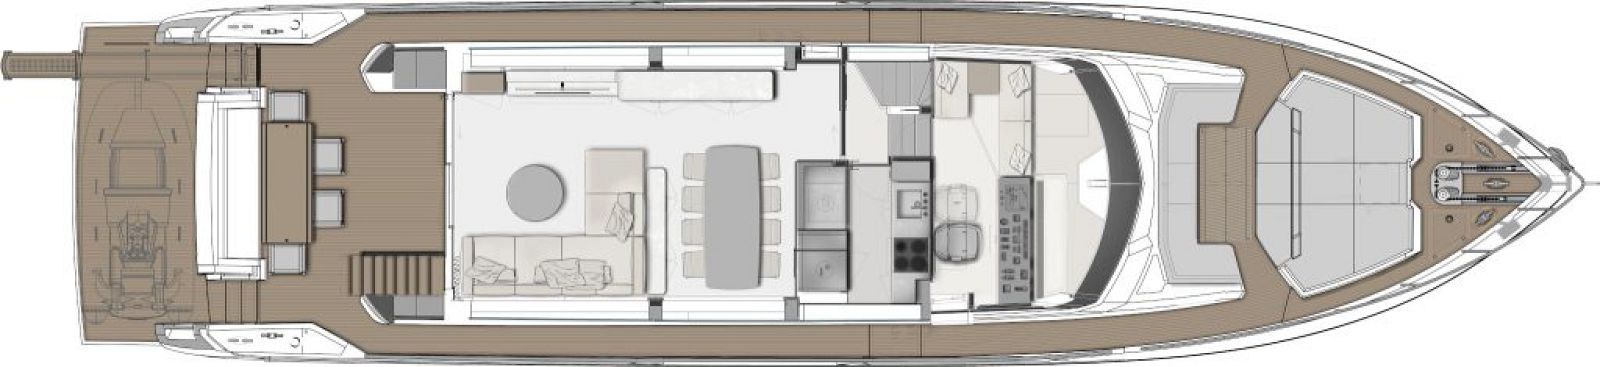 Ferretti Yachts 780 Layout - New Luxury Yacht for Sale >